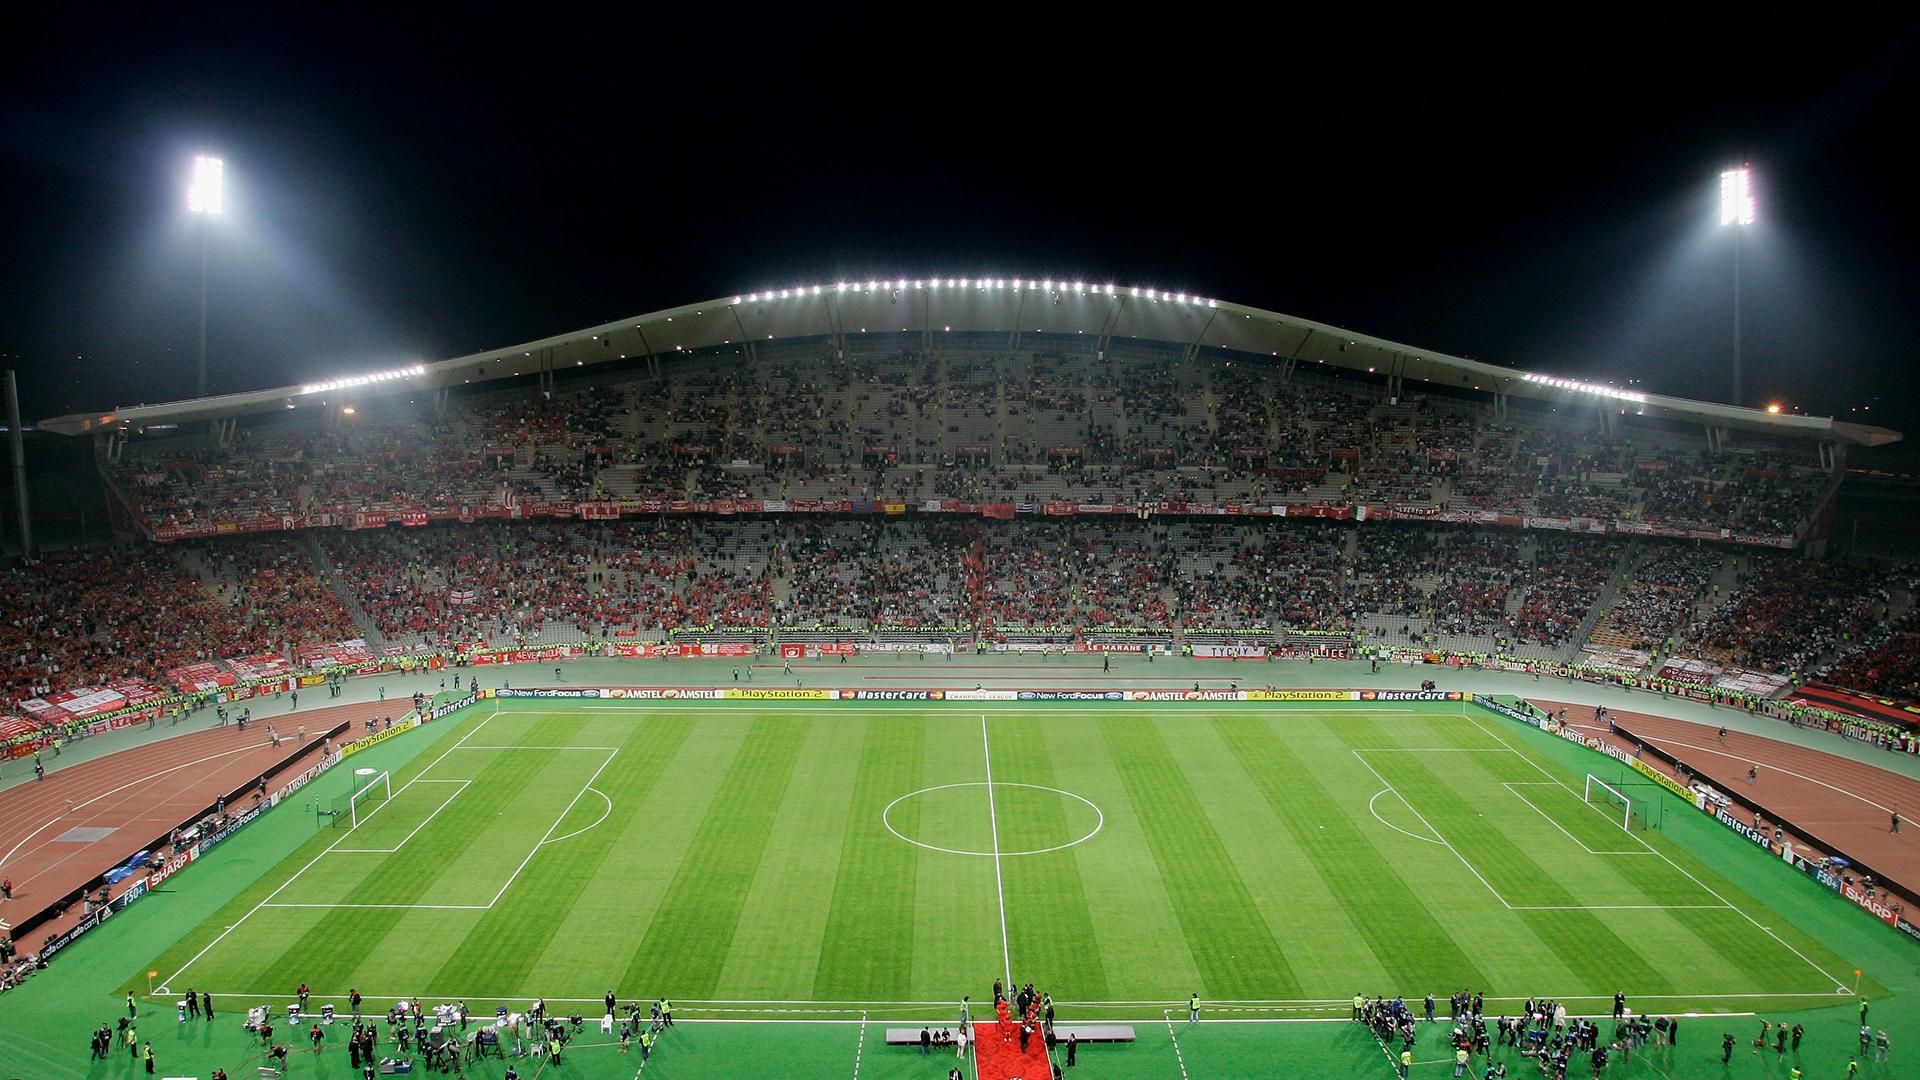 Ataturk Olympic Stadium Istanbul Turkey Champions League 2019-20